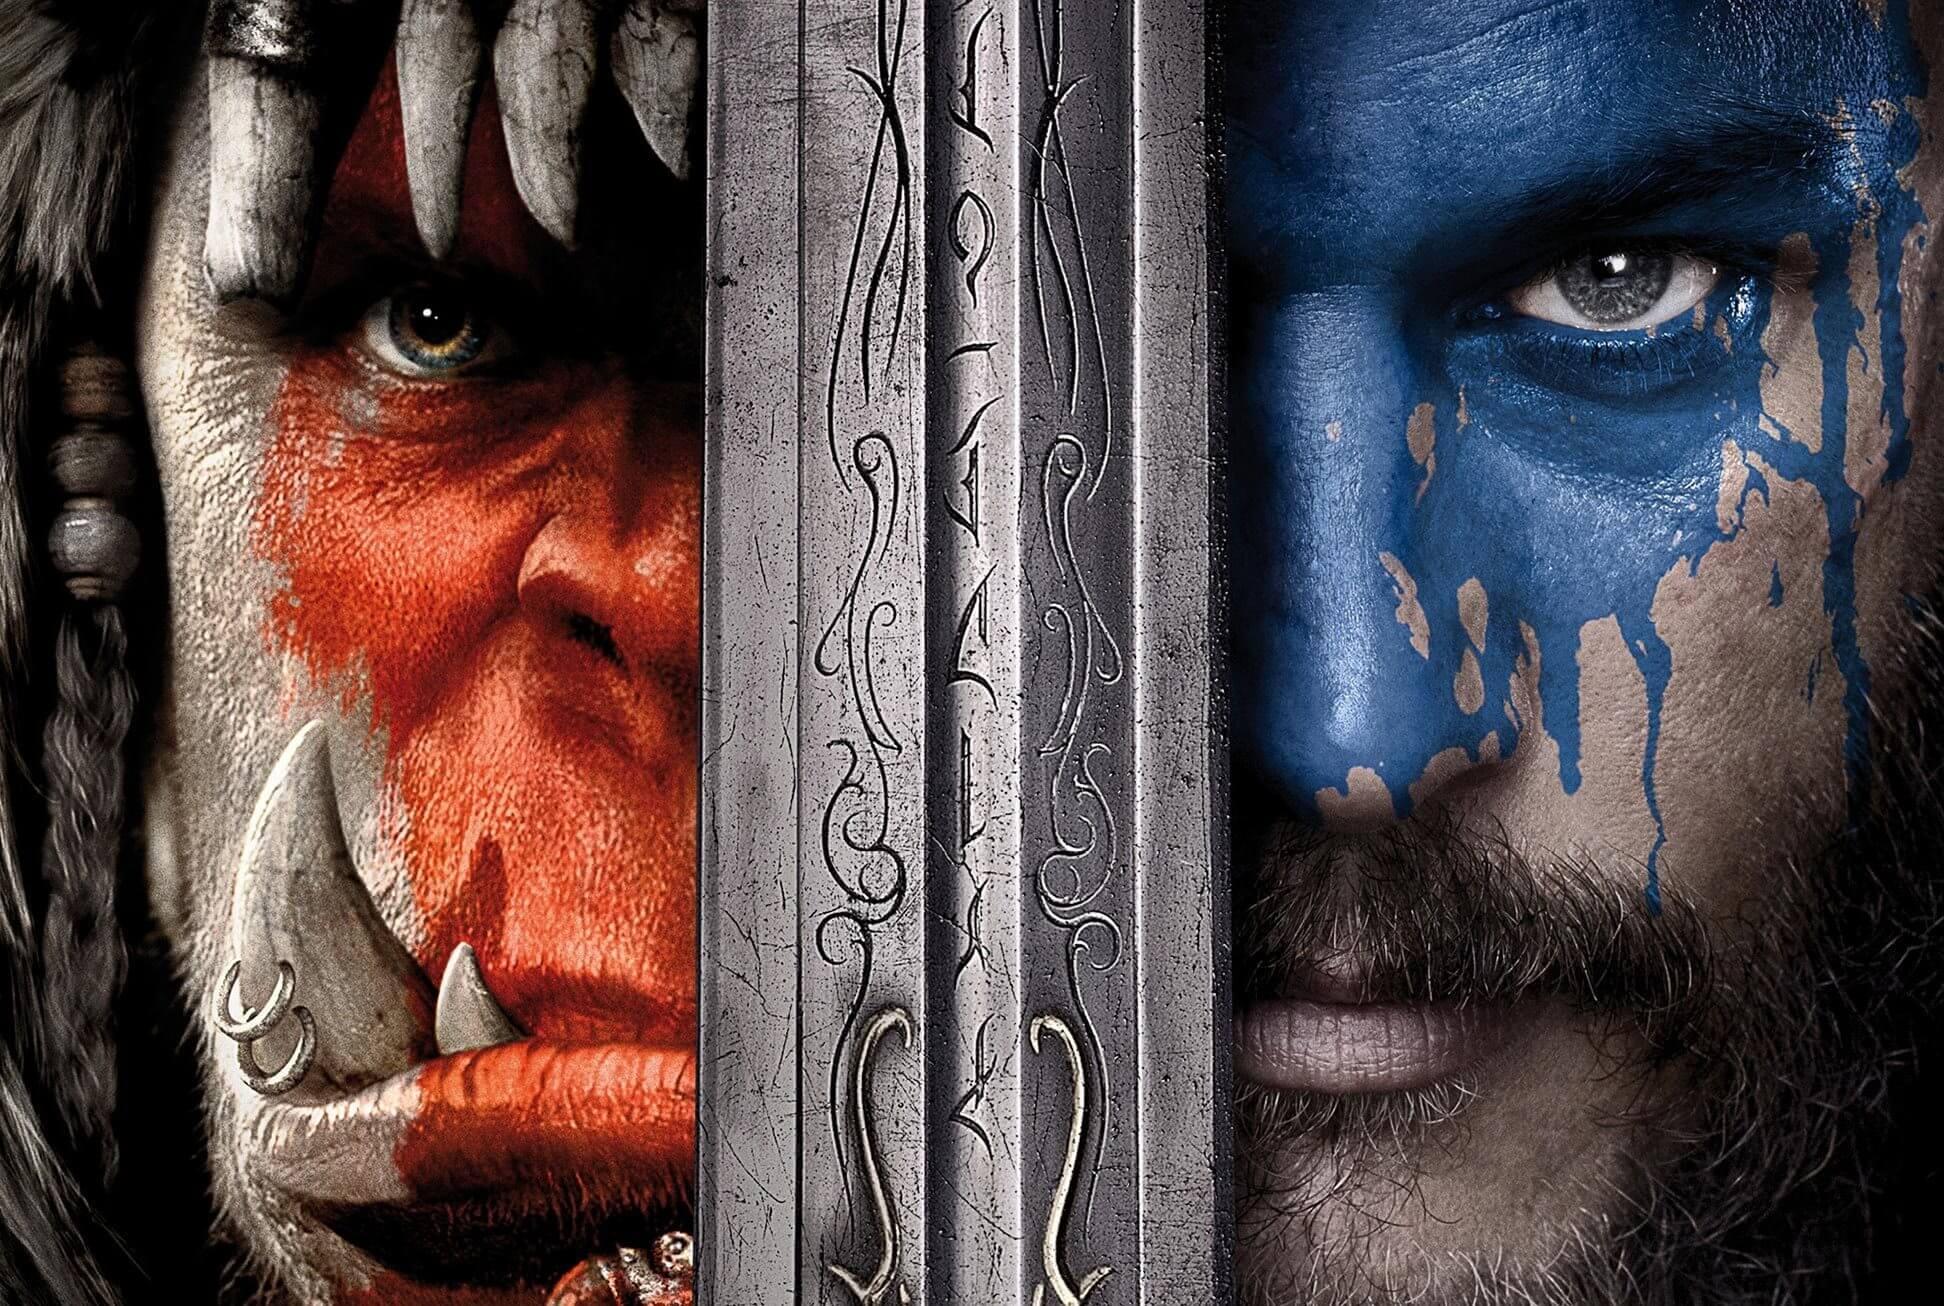 Warcraft-The-Beginning-Poster-01smt